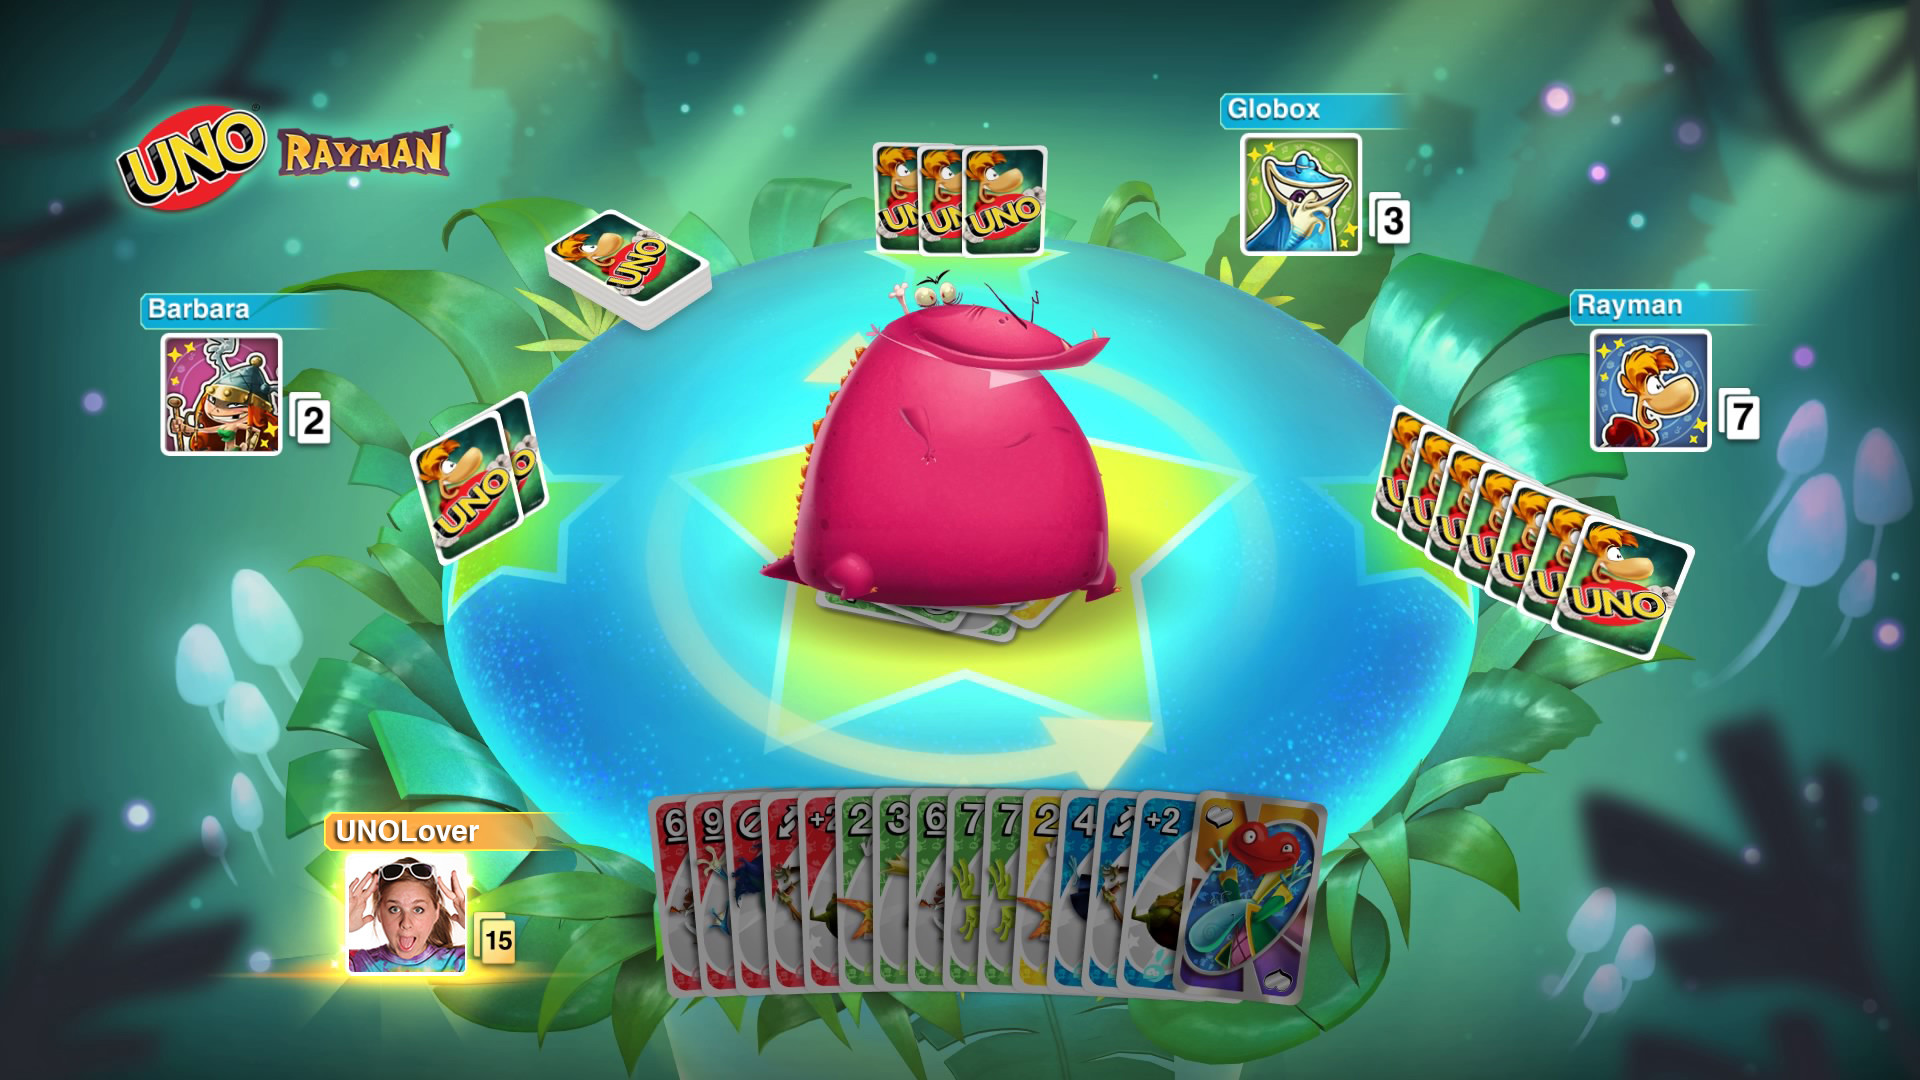 Uno Screenshot DLC Rayman 1 Screenshot